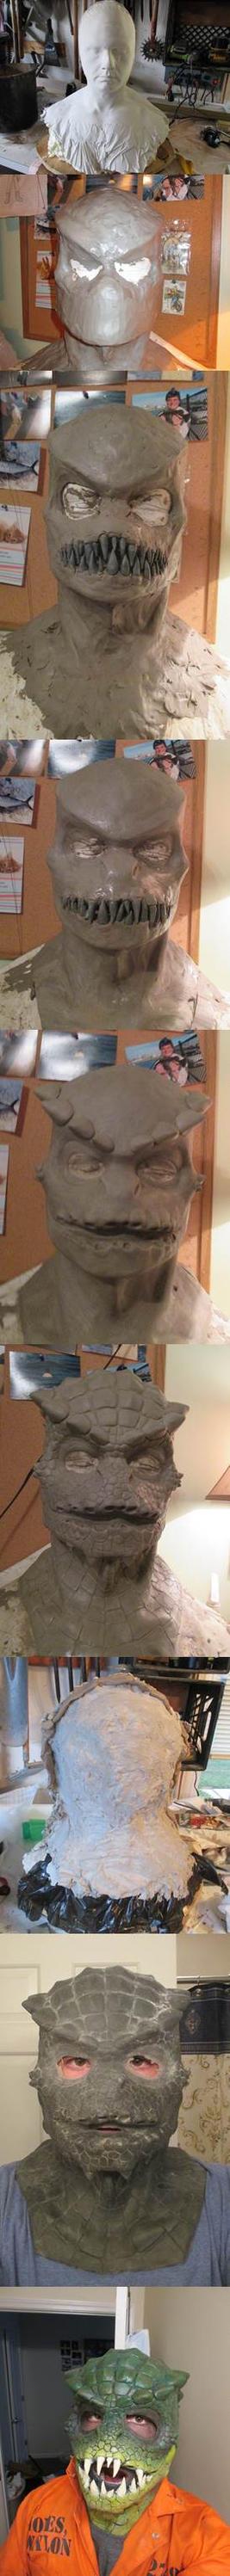 Making the Killer Croc Mask (progression) by MisterAlterEgo